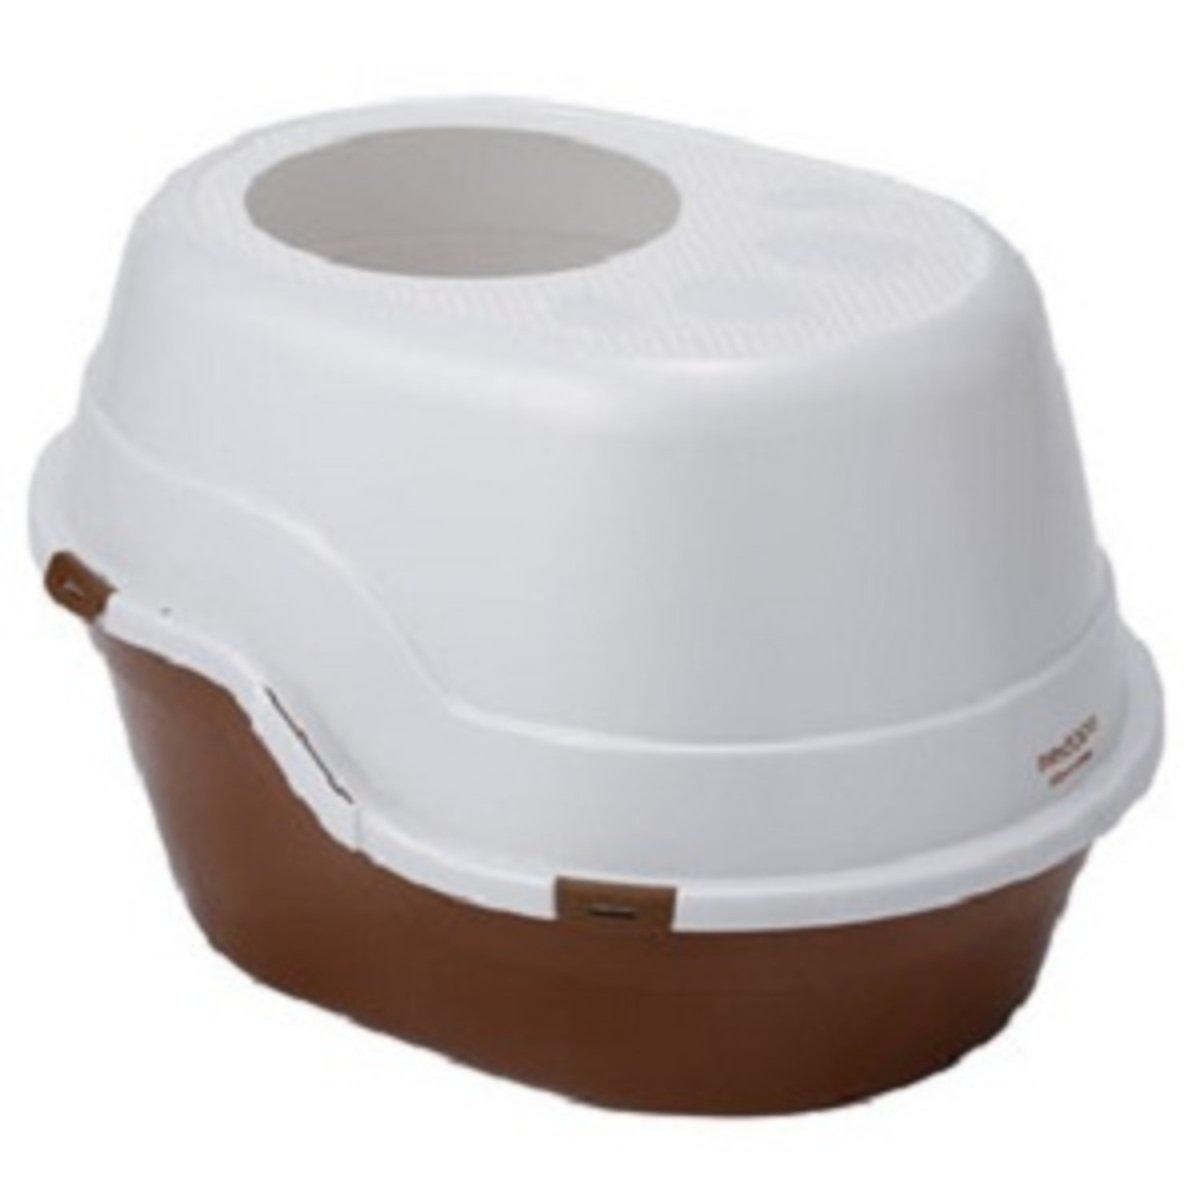 necoco封閉式單層貓廁所(棕色) #F25 (W25099)